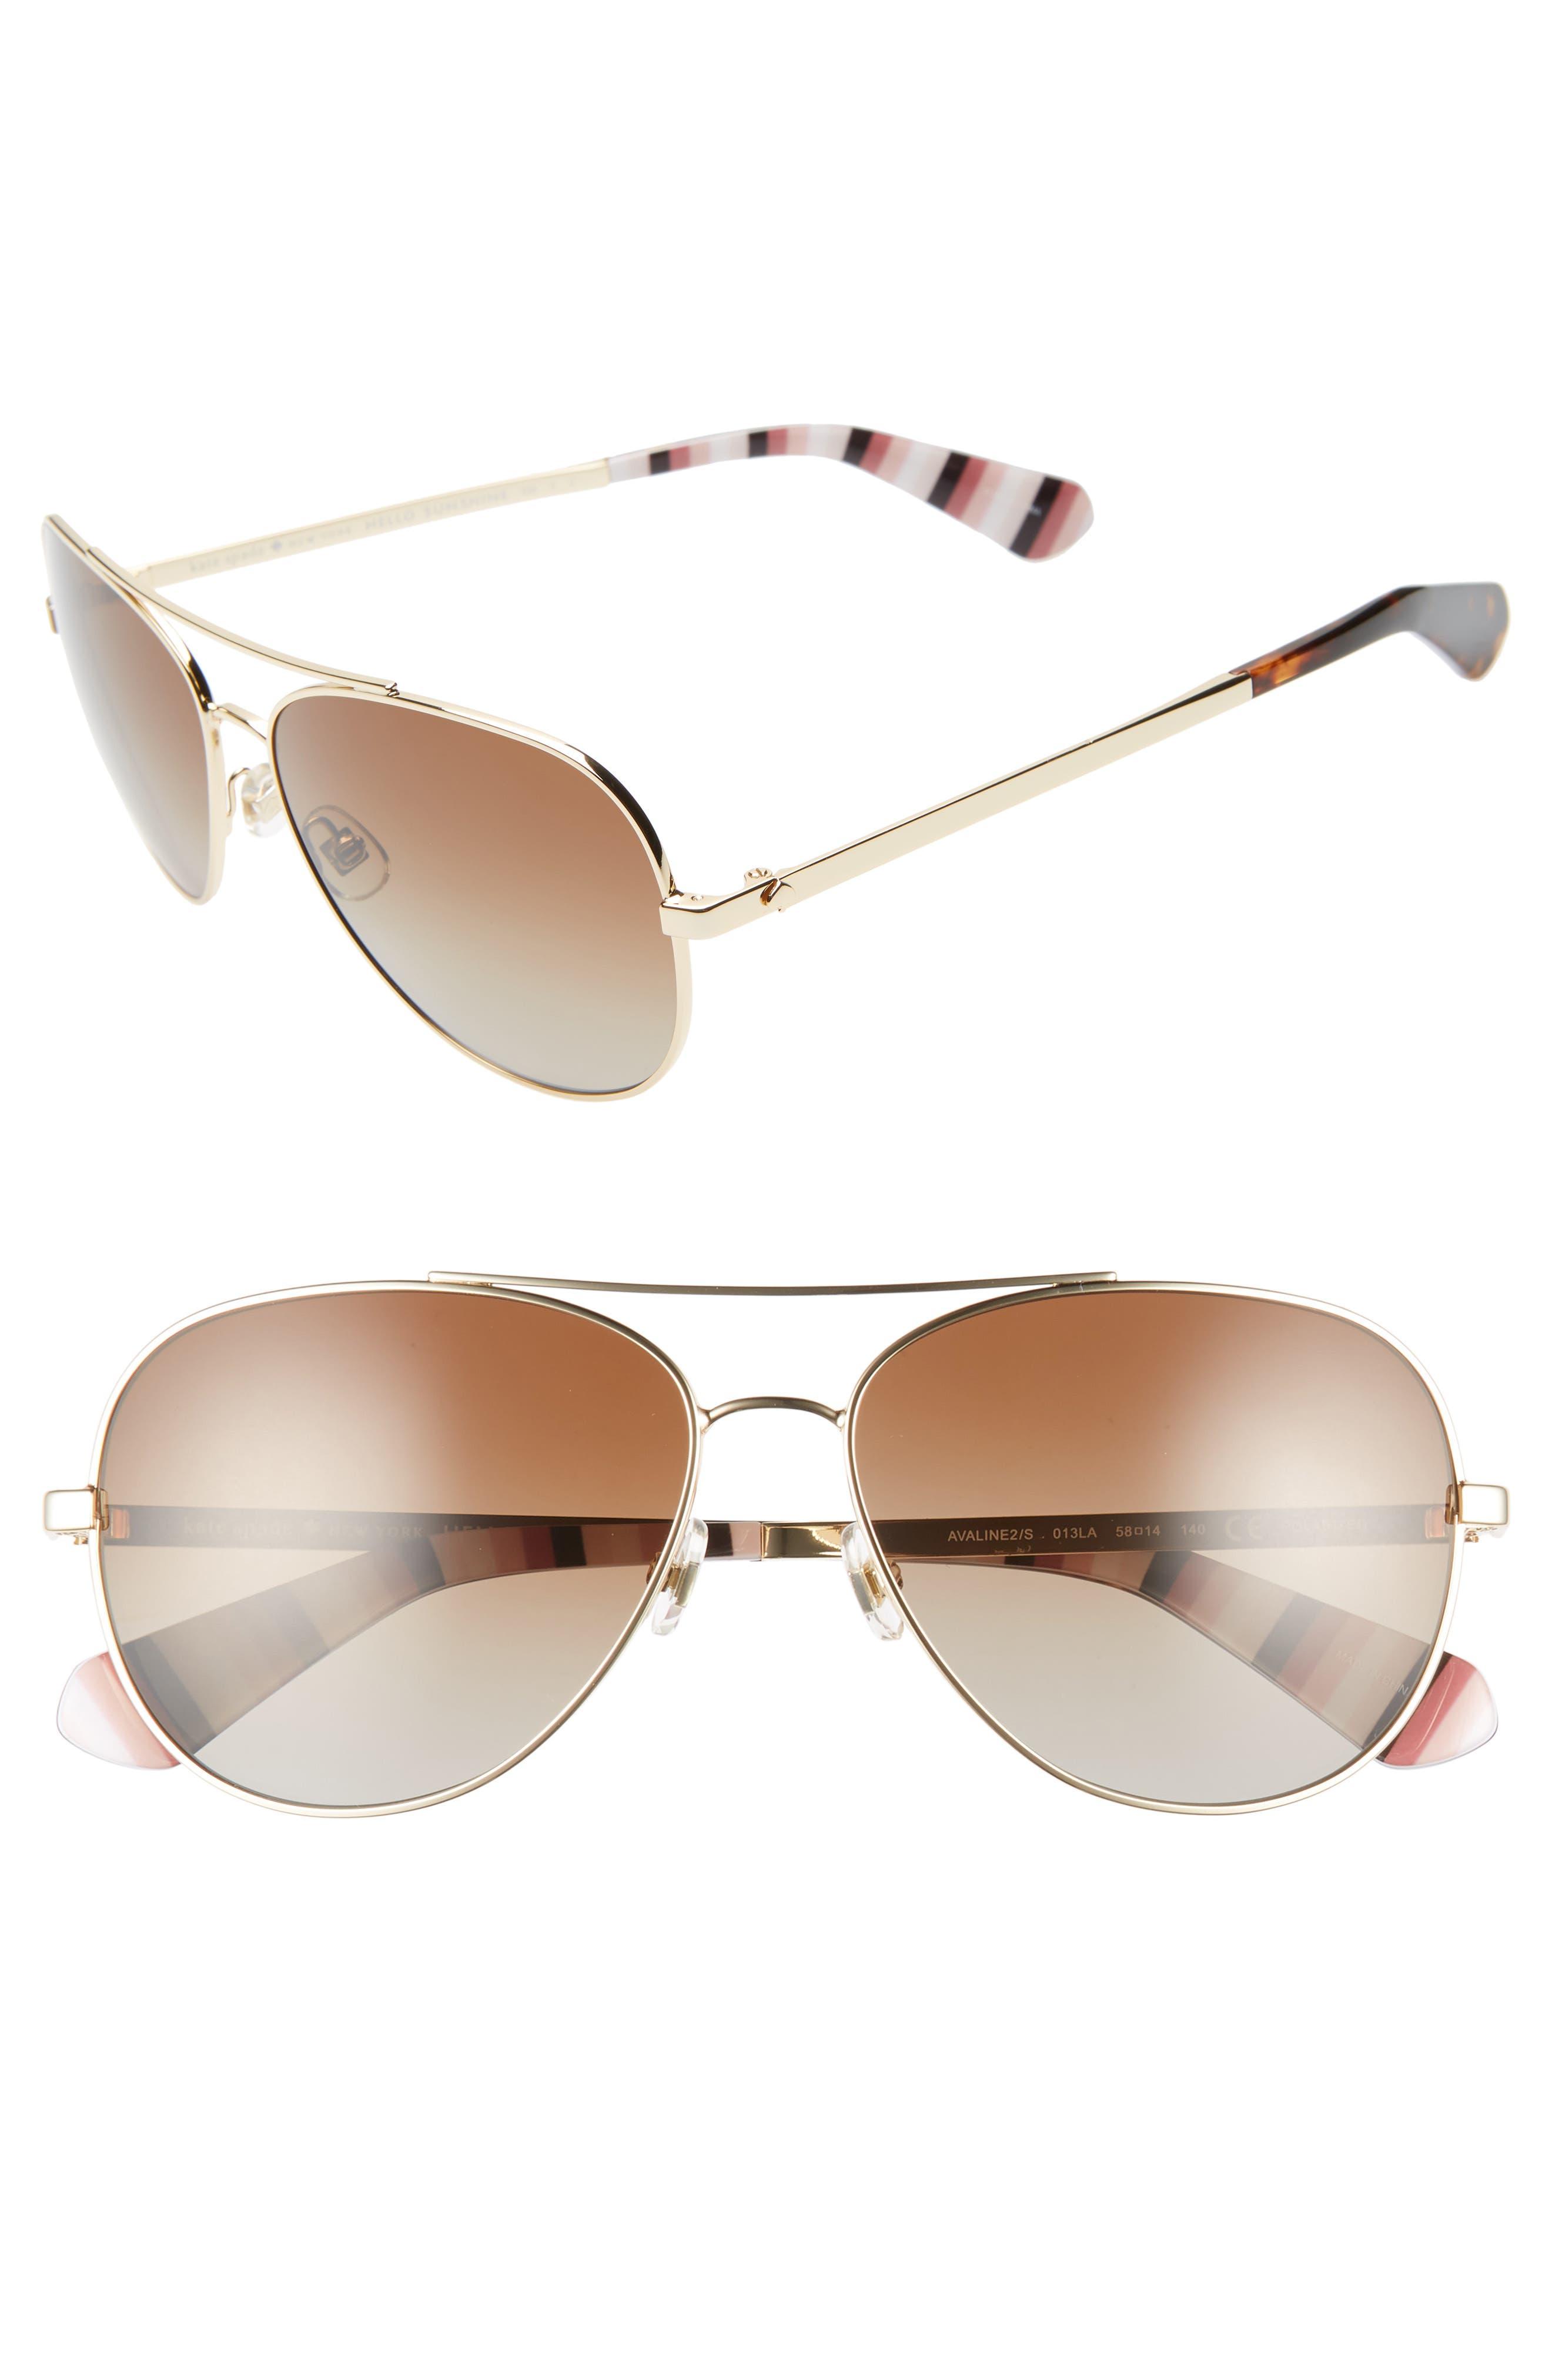 KATE SPADE NEW YORK, avaline 2 58mm polarized aviator sunglasses, Main thumbnail 1, color, GOLD